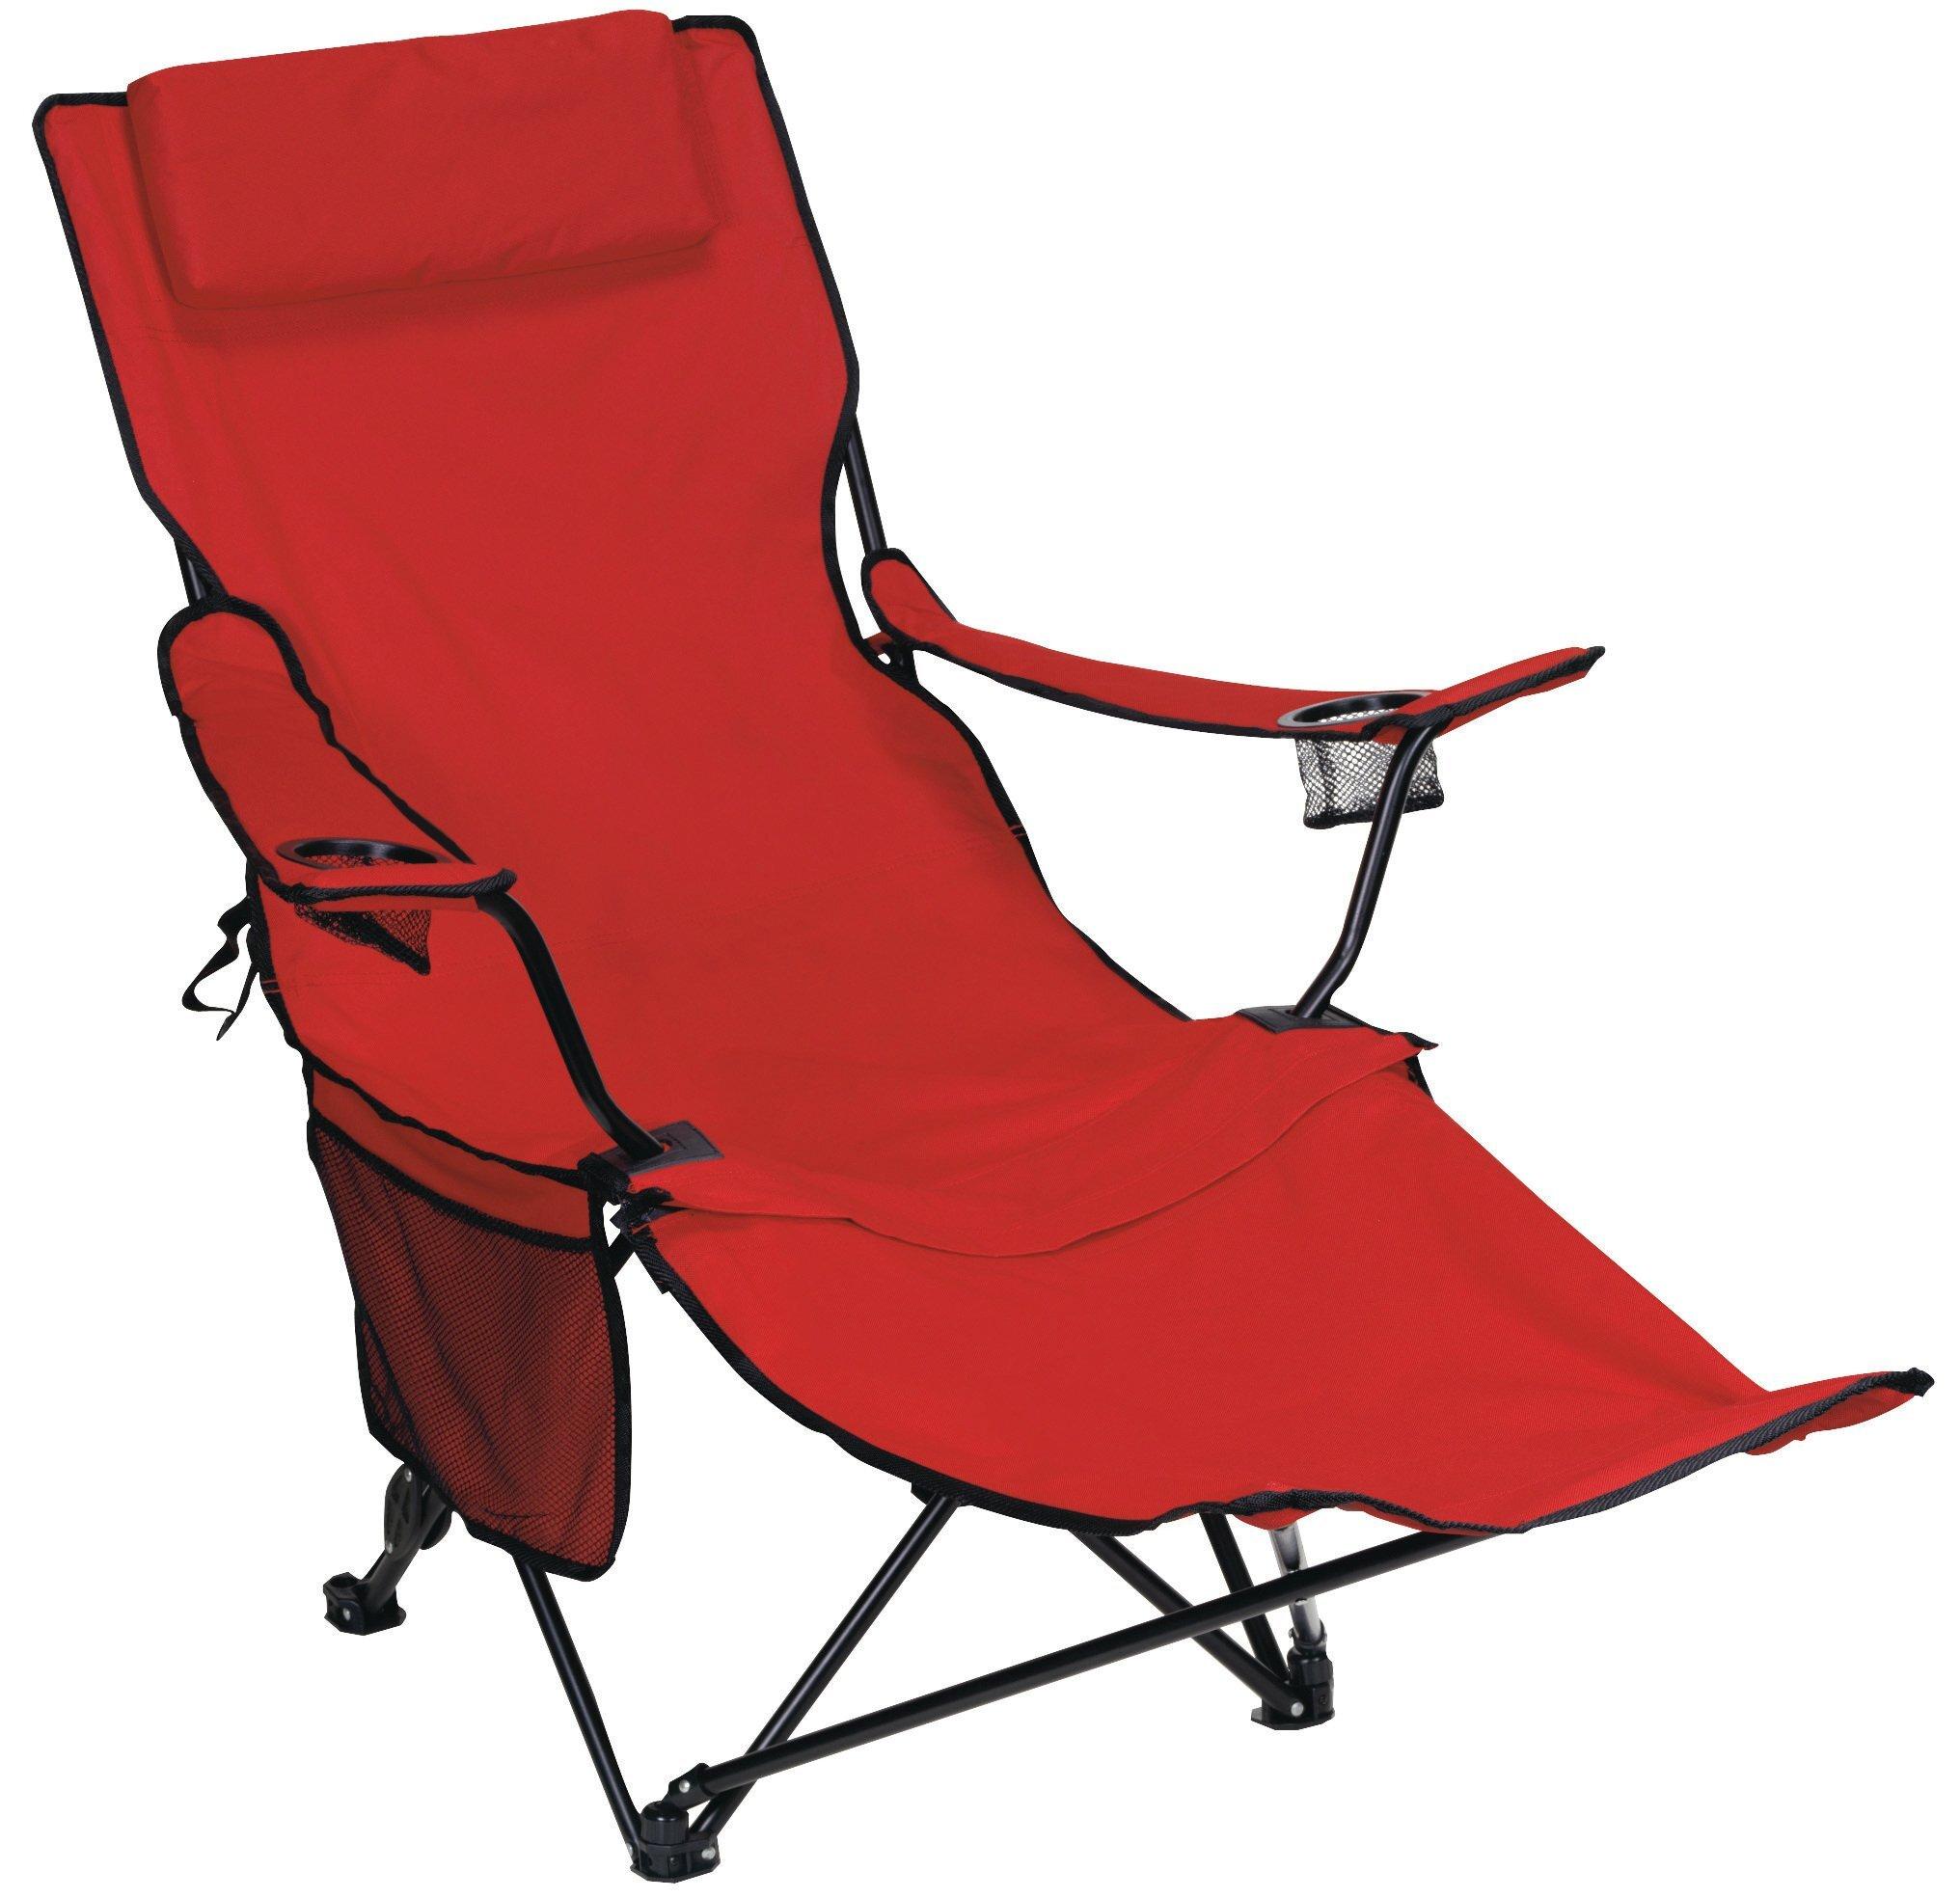 Adirondack Outdoor Recliner Chair